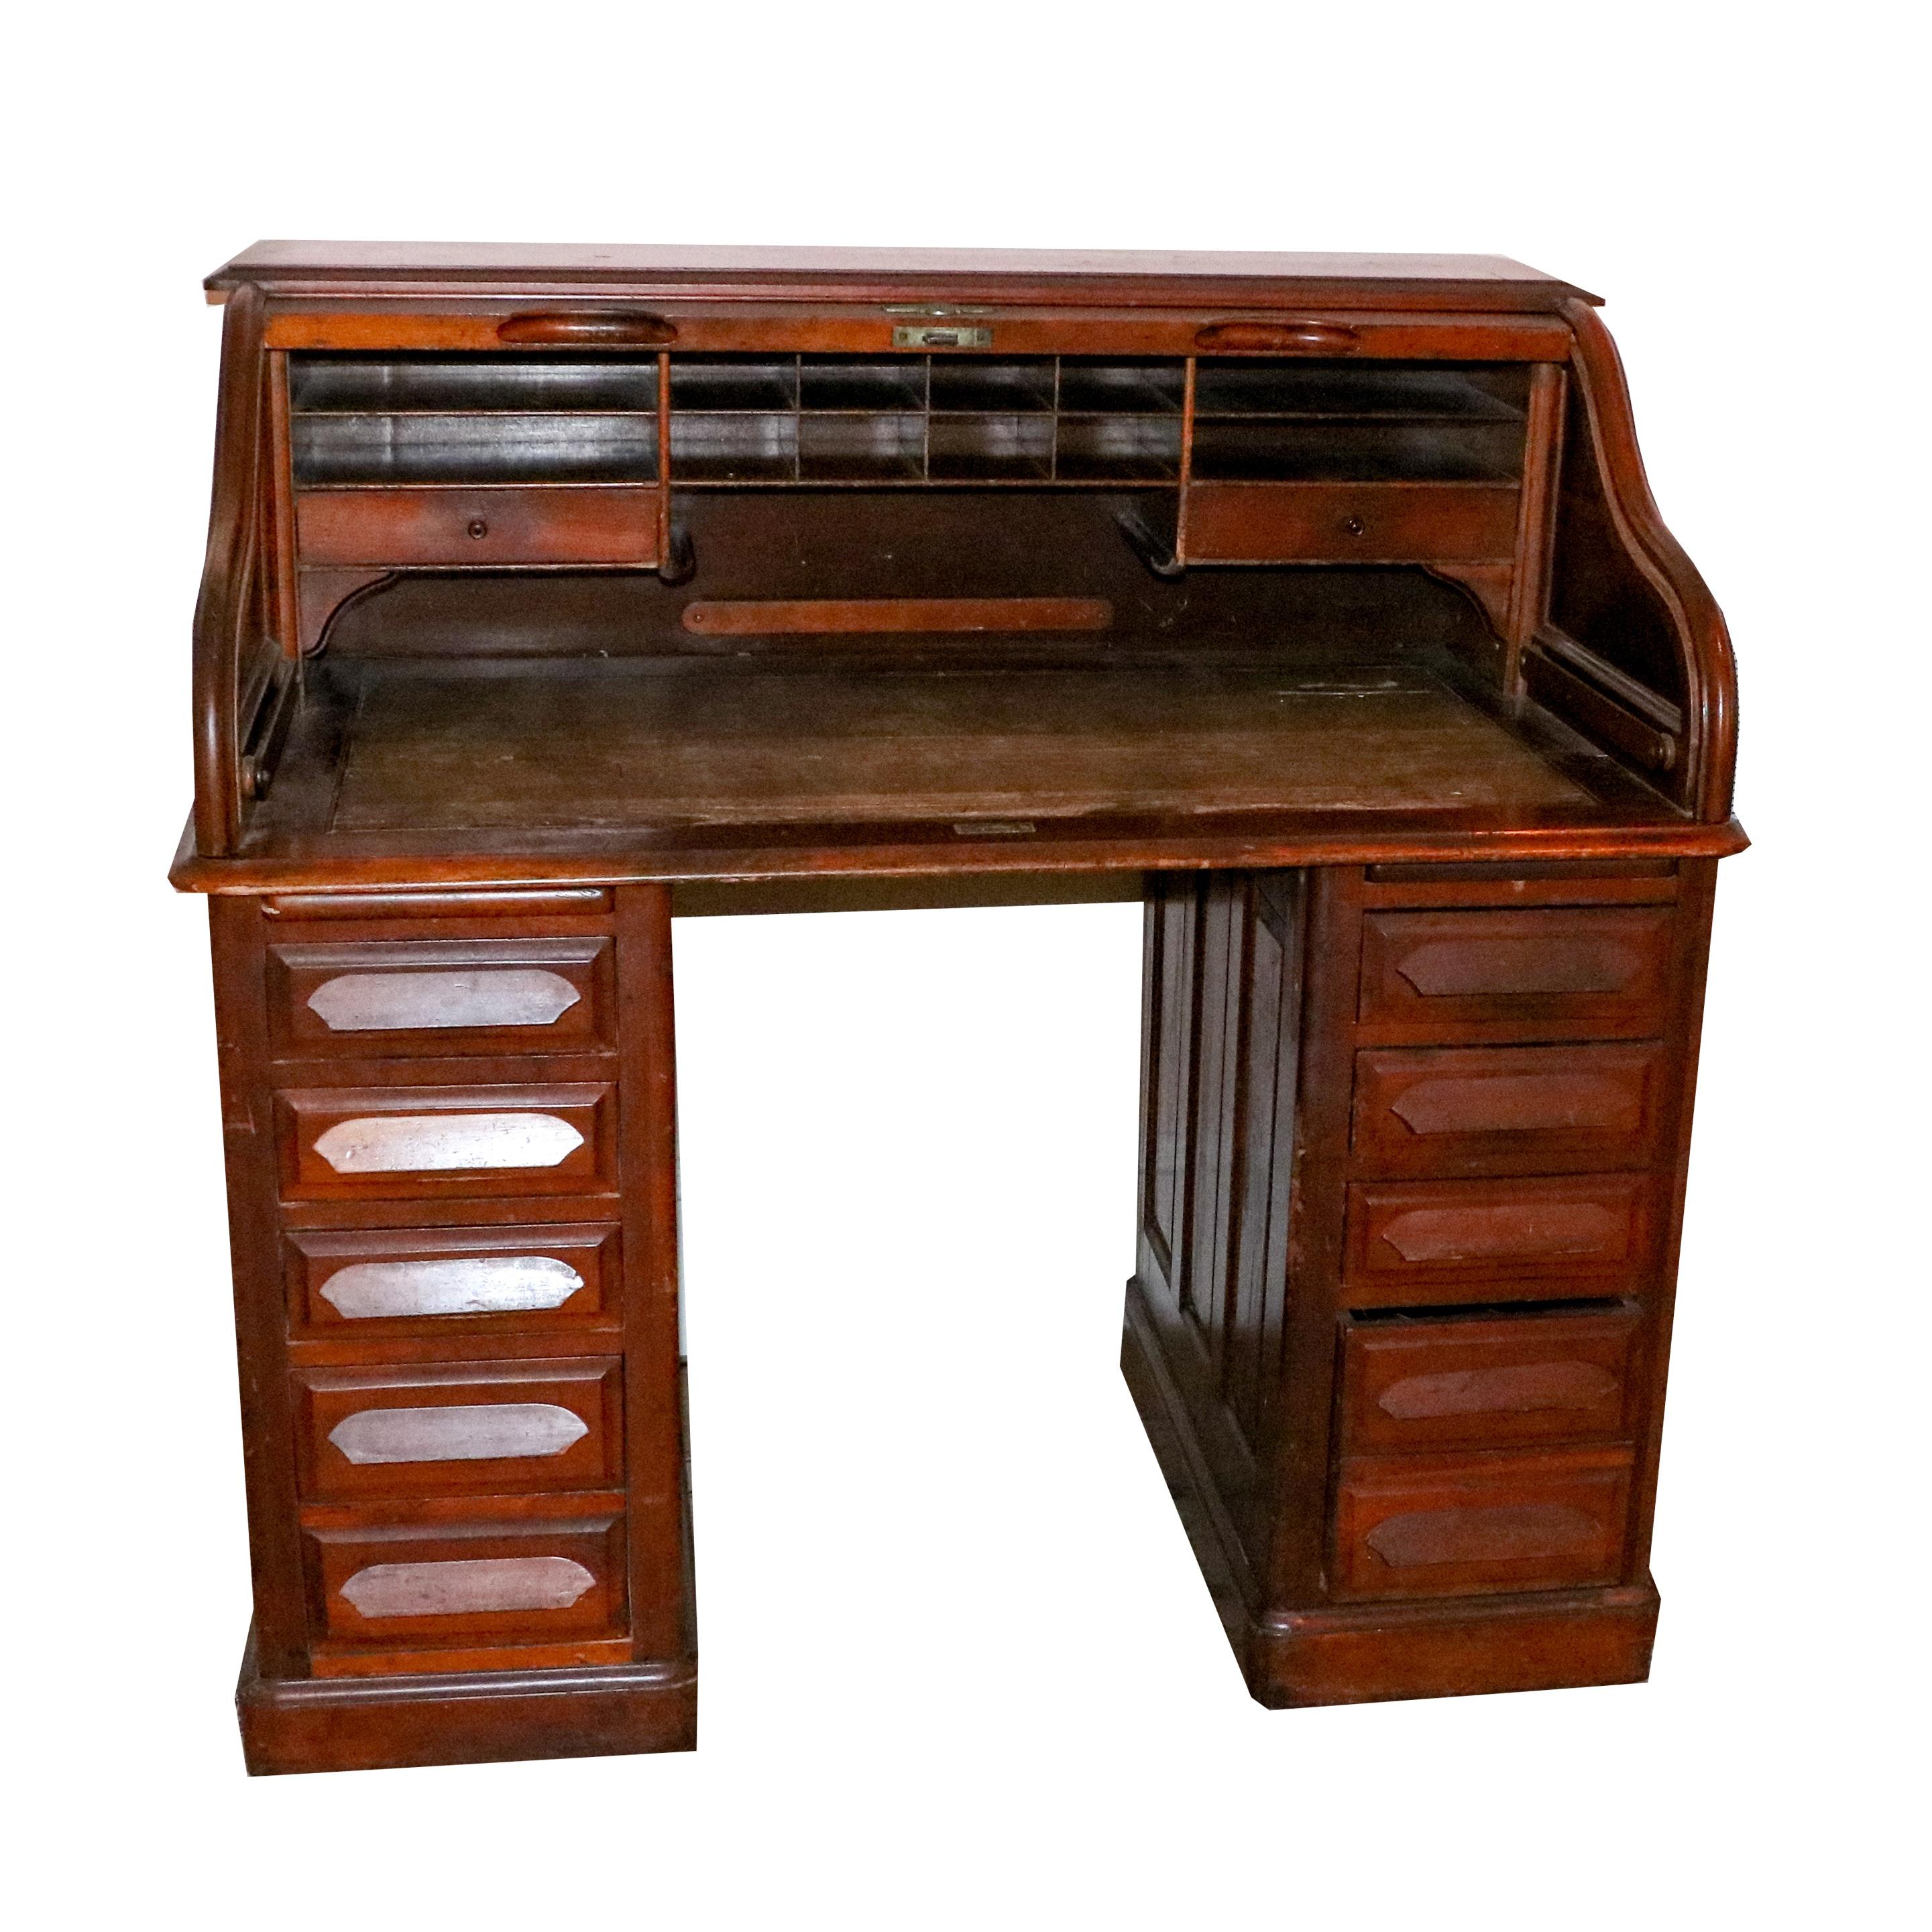 Wooden Roll Top Kneehole Desk by Union Desk Company